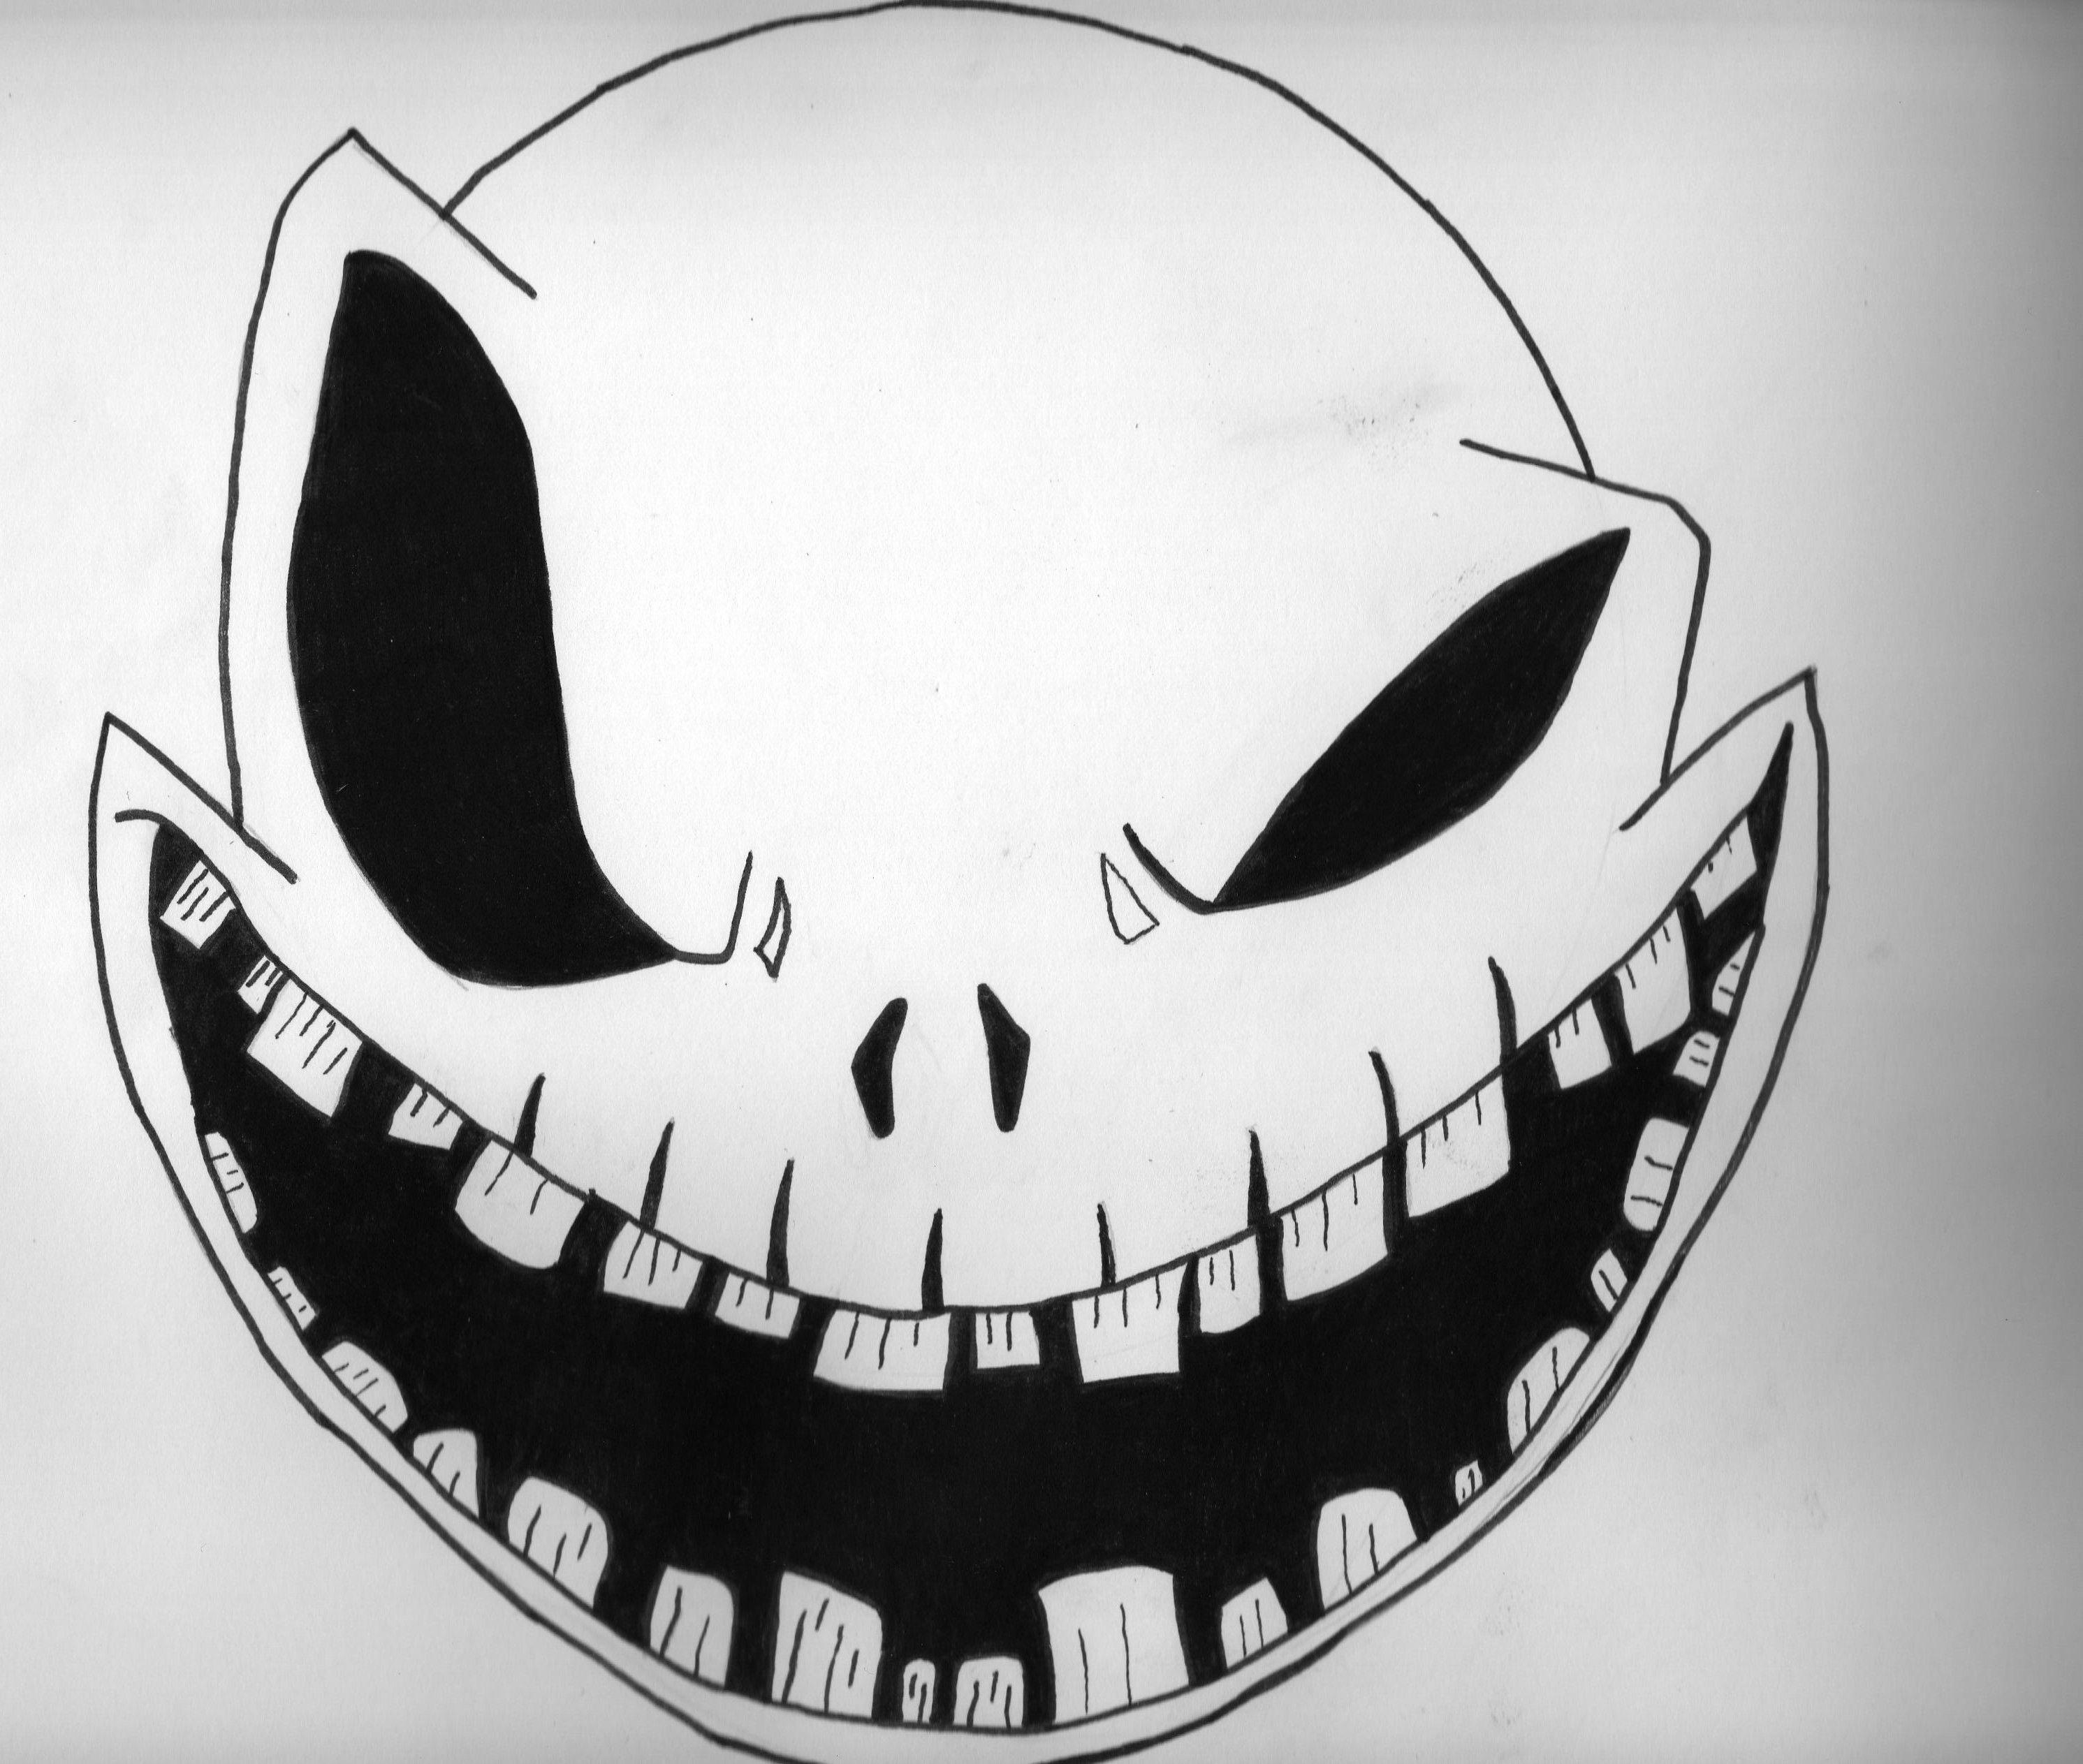 Scary Pumpkin Patterns Free Printable | Monster Face Pumpkin Stencil - Free Printable Scary Pumpkin Patterns